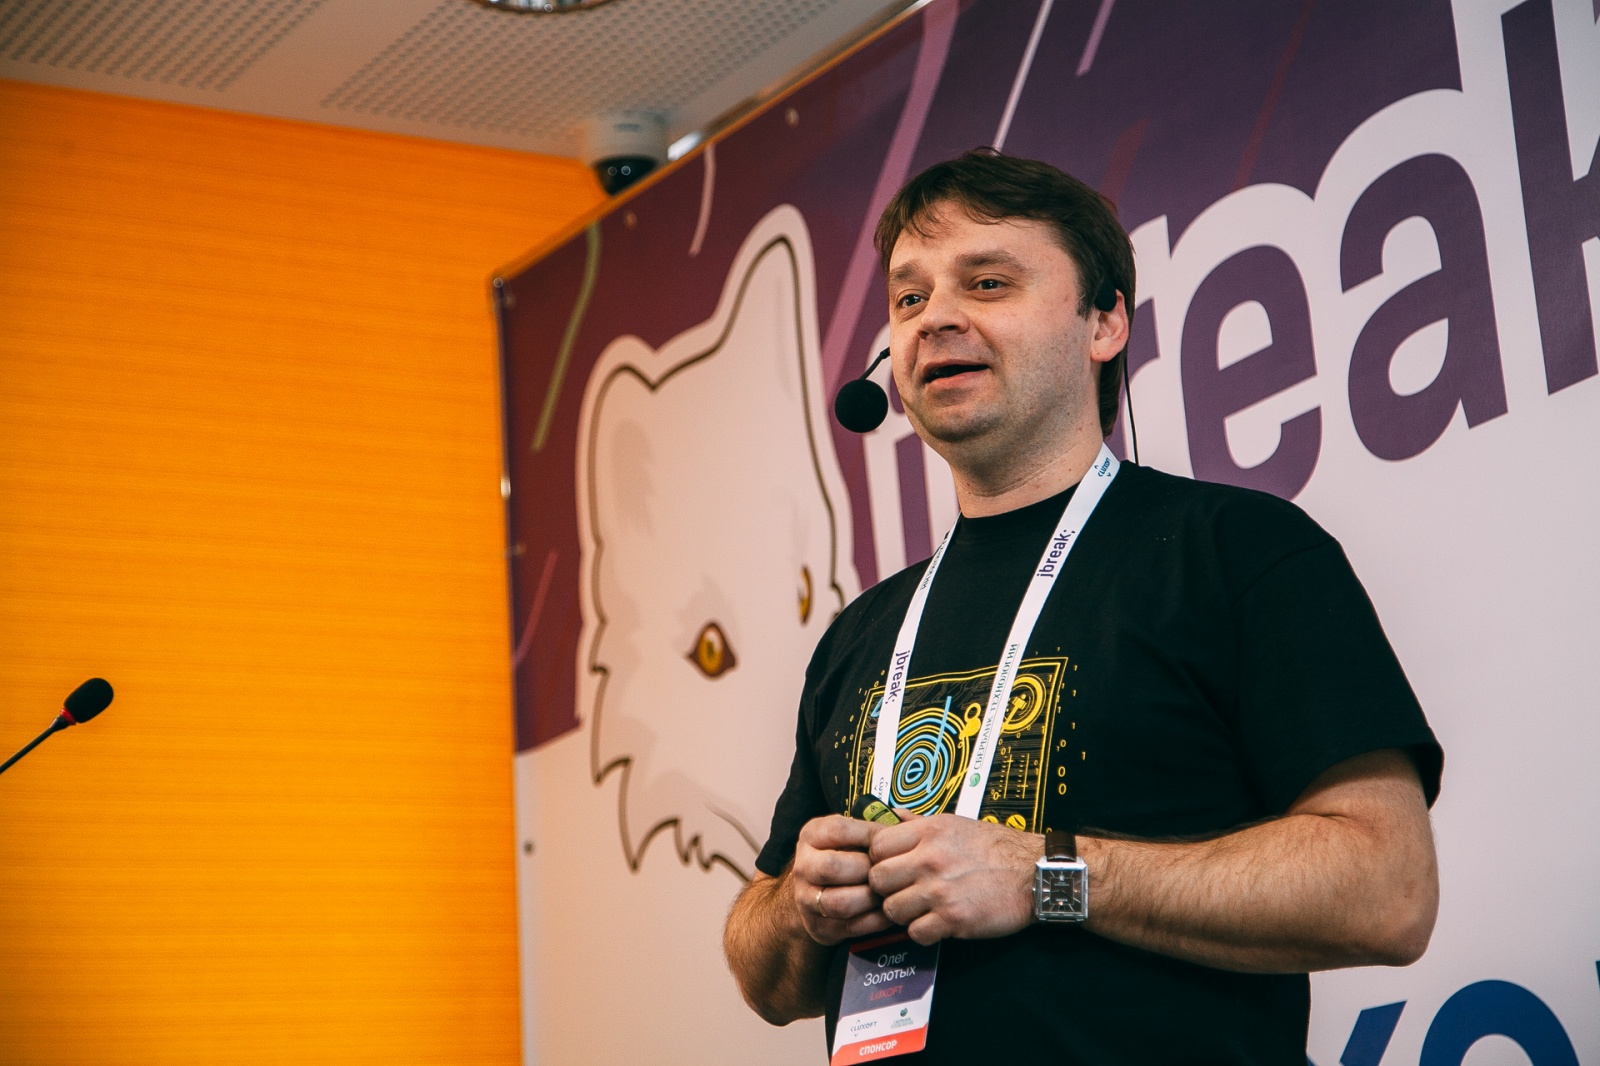 Java-конференция JBreak: Покорение Сибири - 7